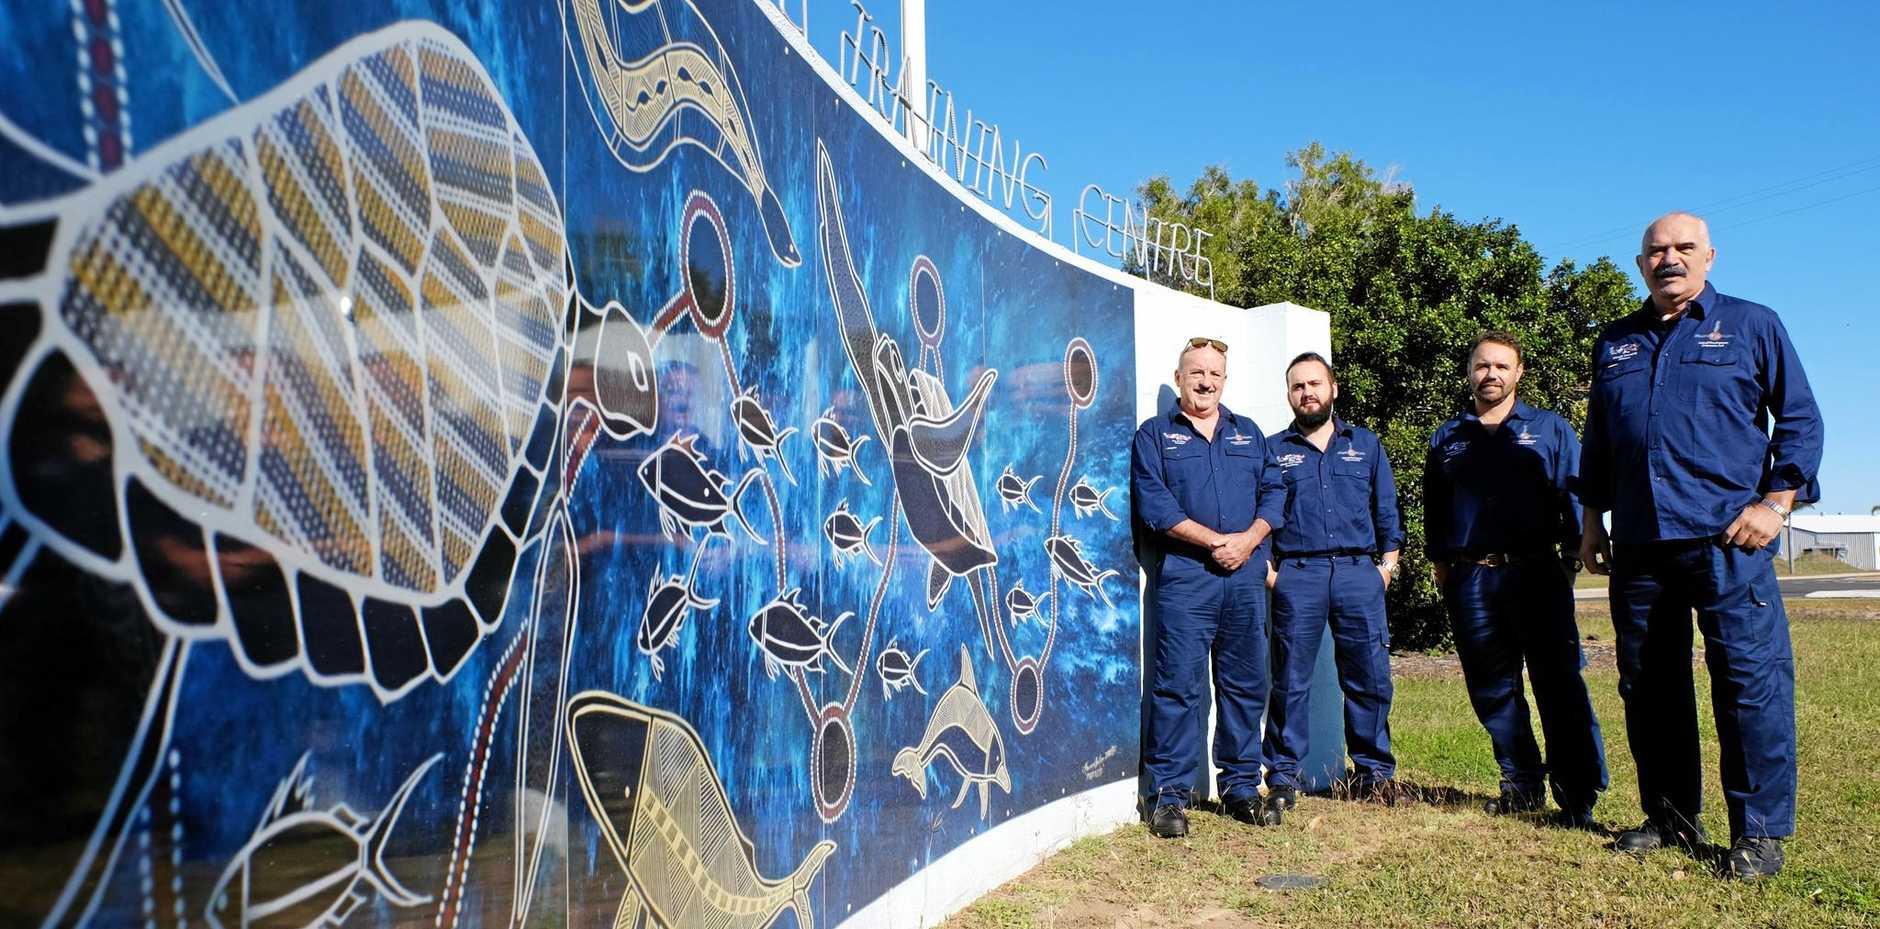 SEA RANGERS: Tom Osborne, Brent McLellan, Quinten Springham and Kerry Blackman.